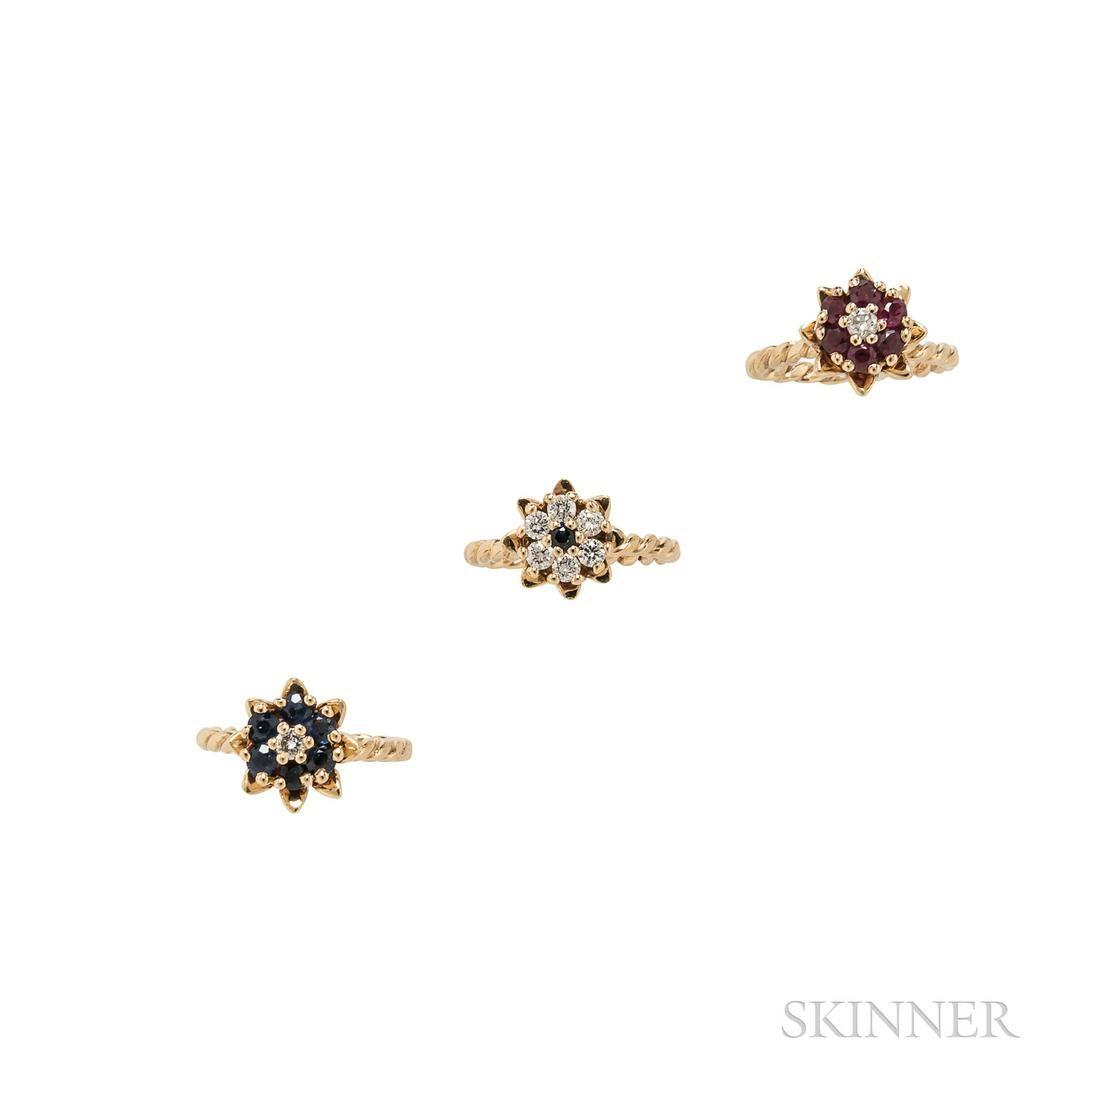 Set of Three 14kt Gold Gem-set Rings